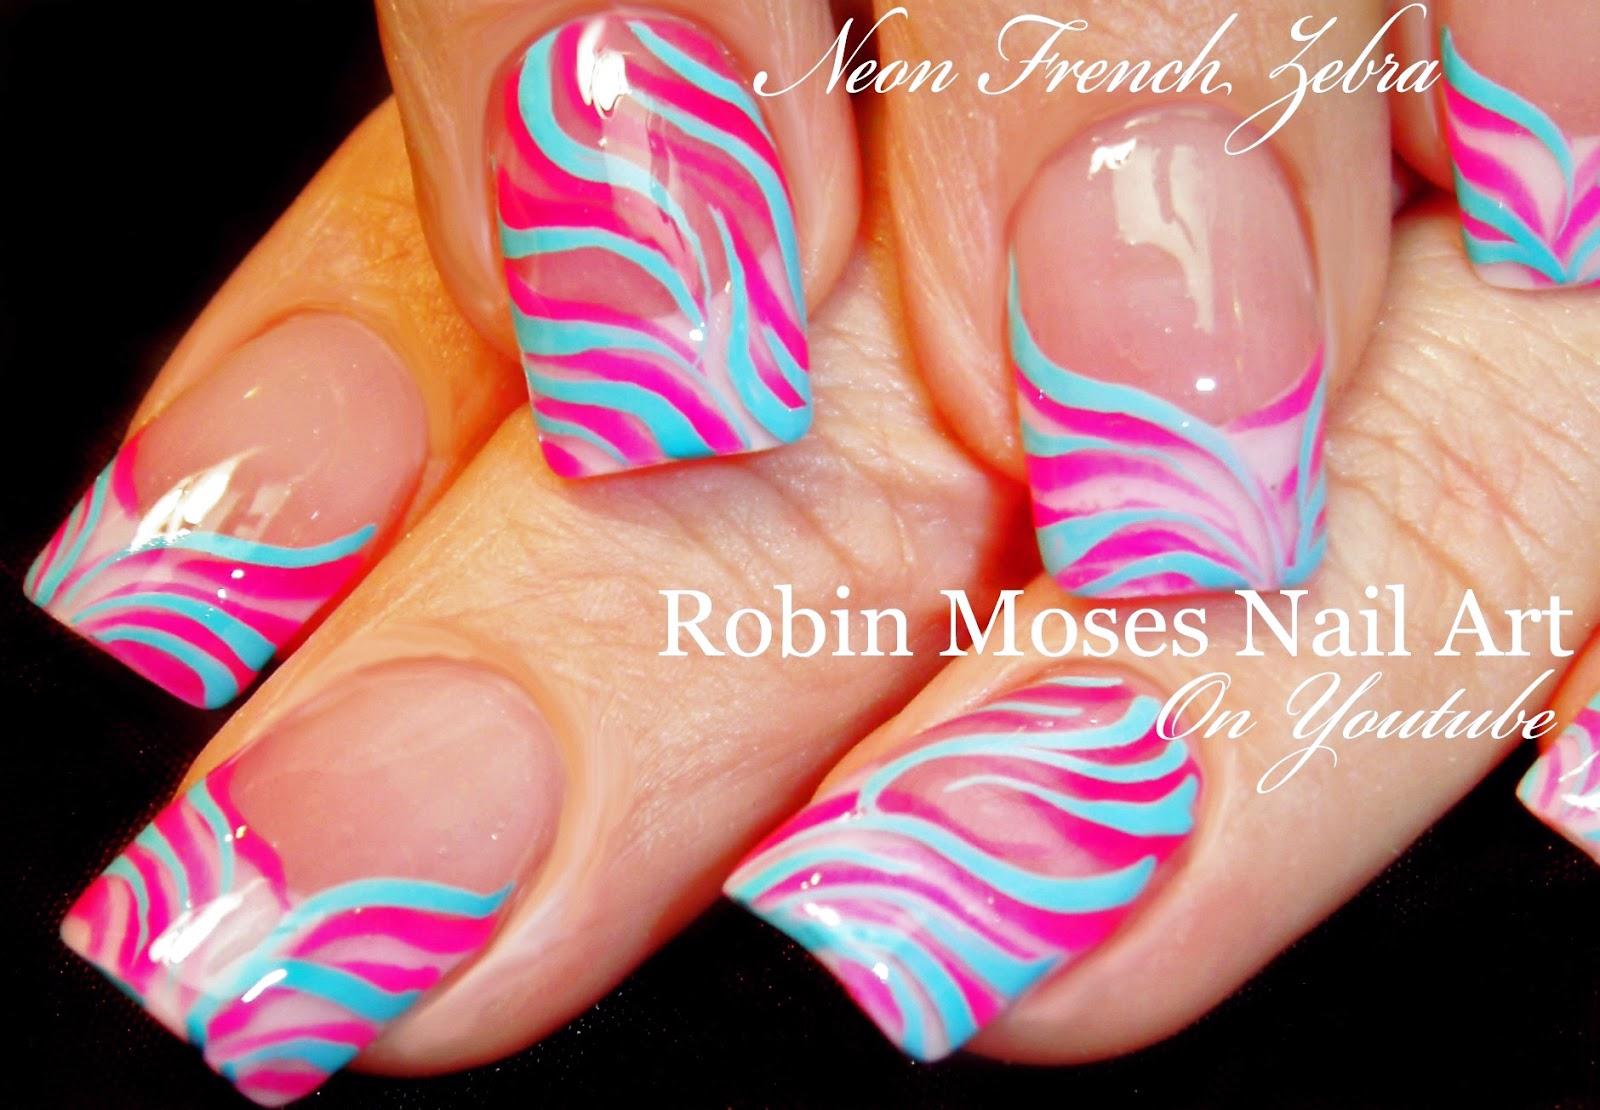 Pink zebra nails nails pinterest - Robin Moses Nail Art Facebook Fanpage Http Www Facebook Com Robinmosesnailart Robin Moses Nail Art Pinterest Http Pinterest Com Robinmoses